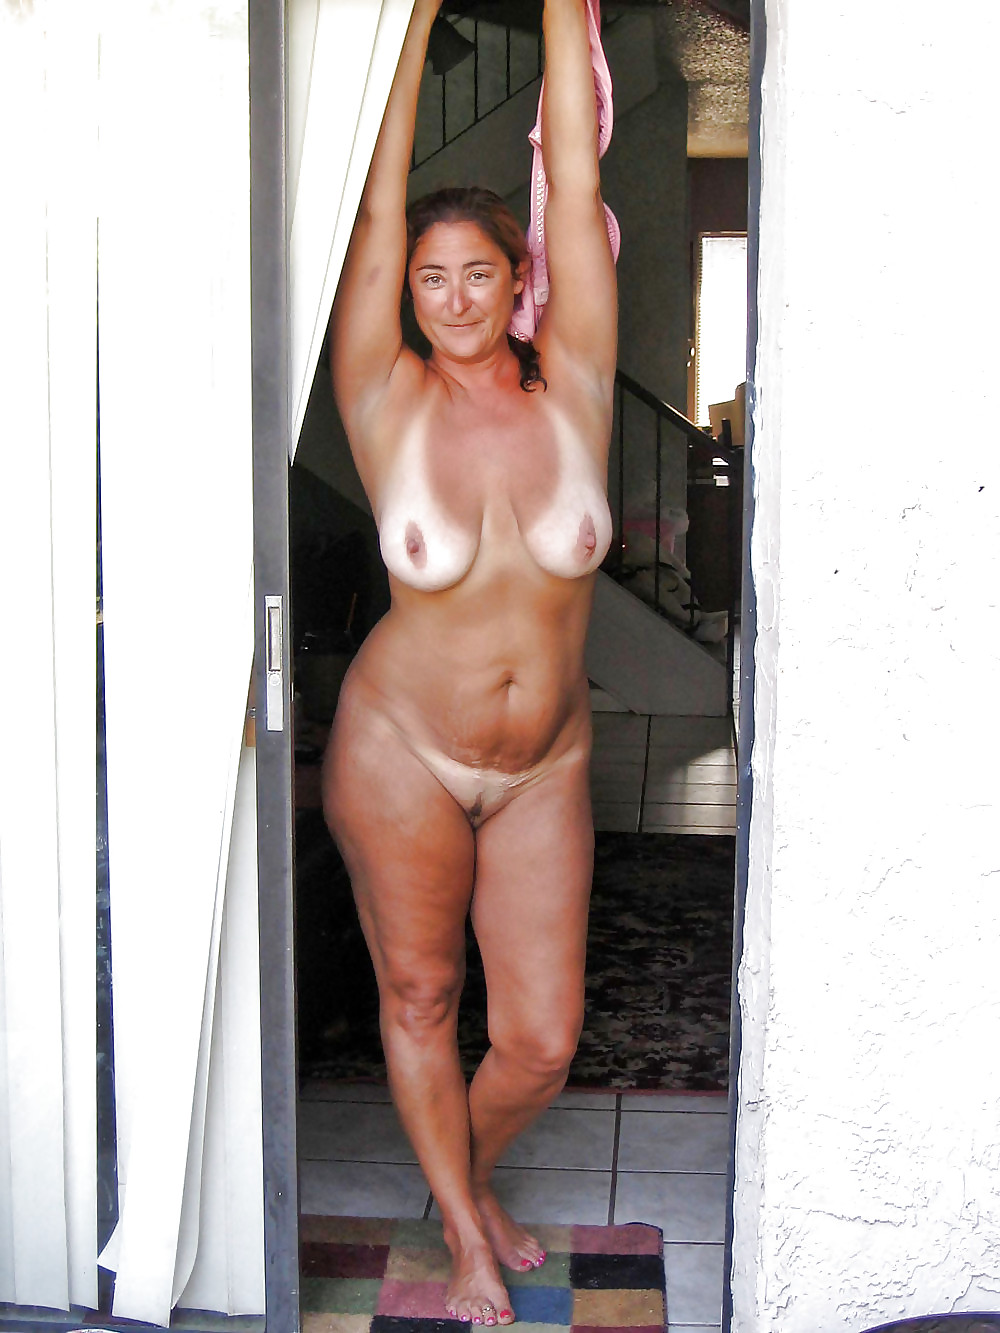 mom-desnuda-amateur-hot-japanese-girls-pictures